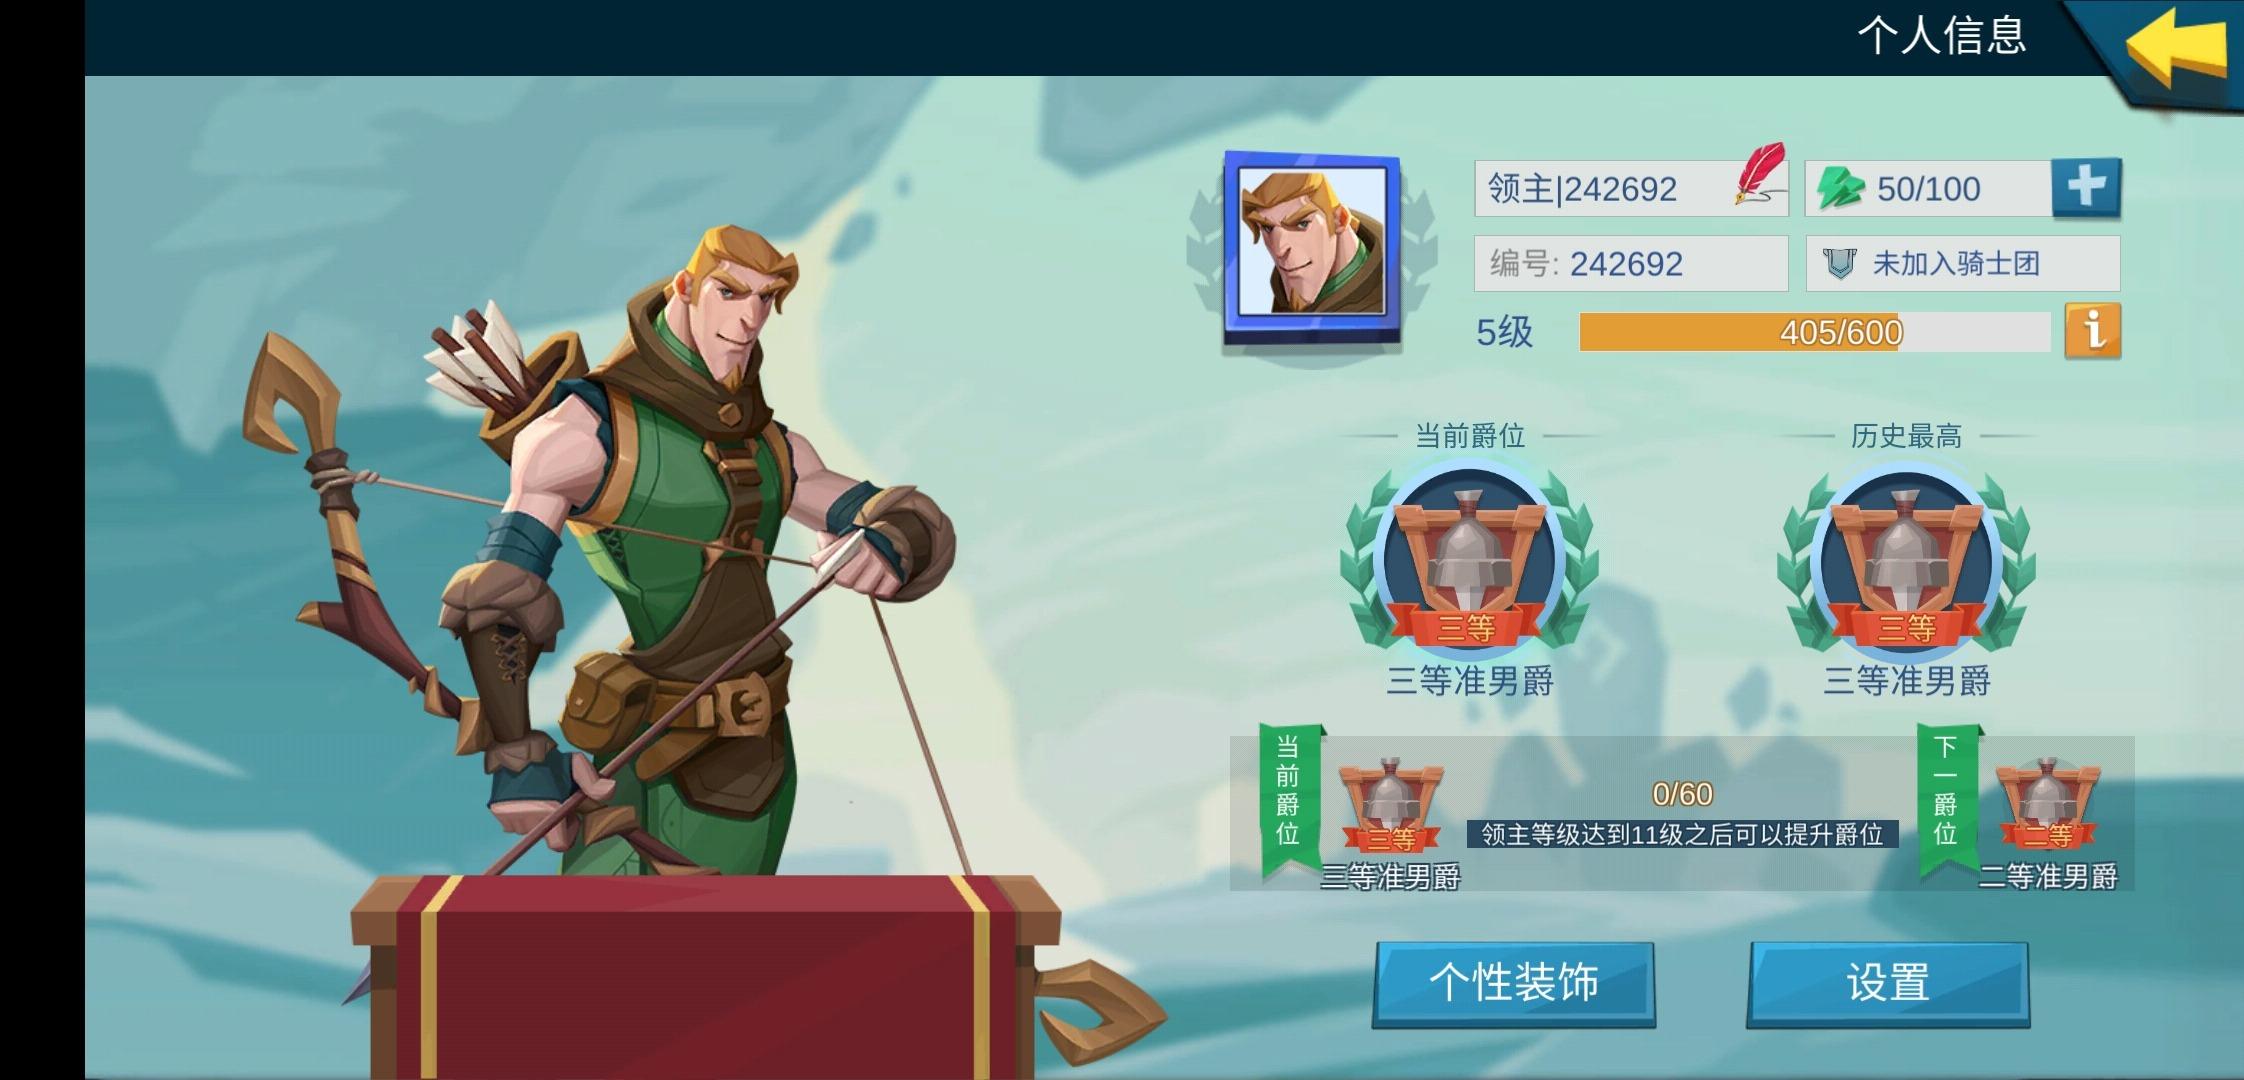 Screenshot_2021-06-01-18-00-41-101_com.jedigames.p21.guanwang.jpg